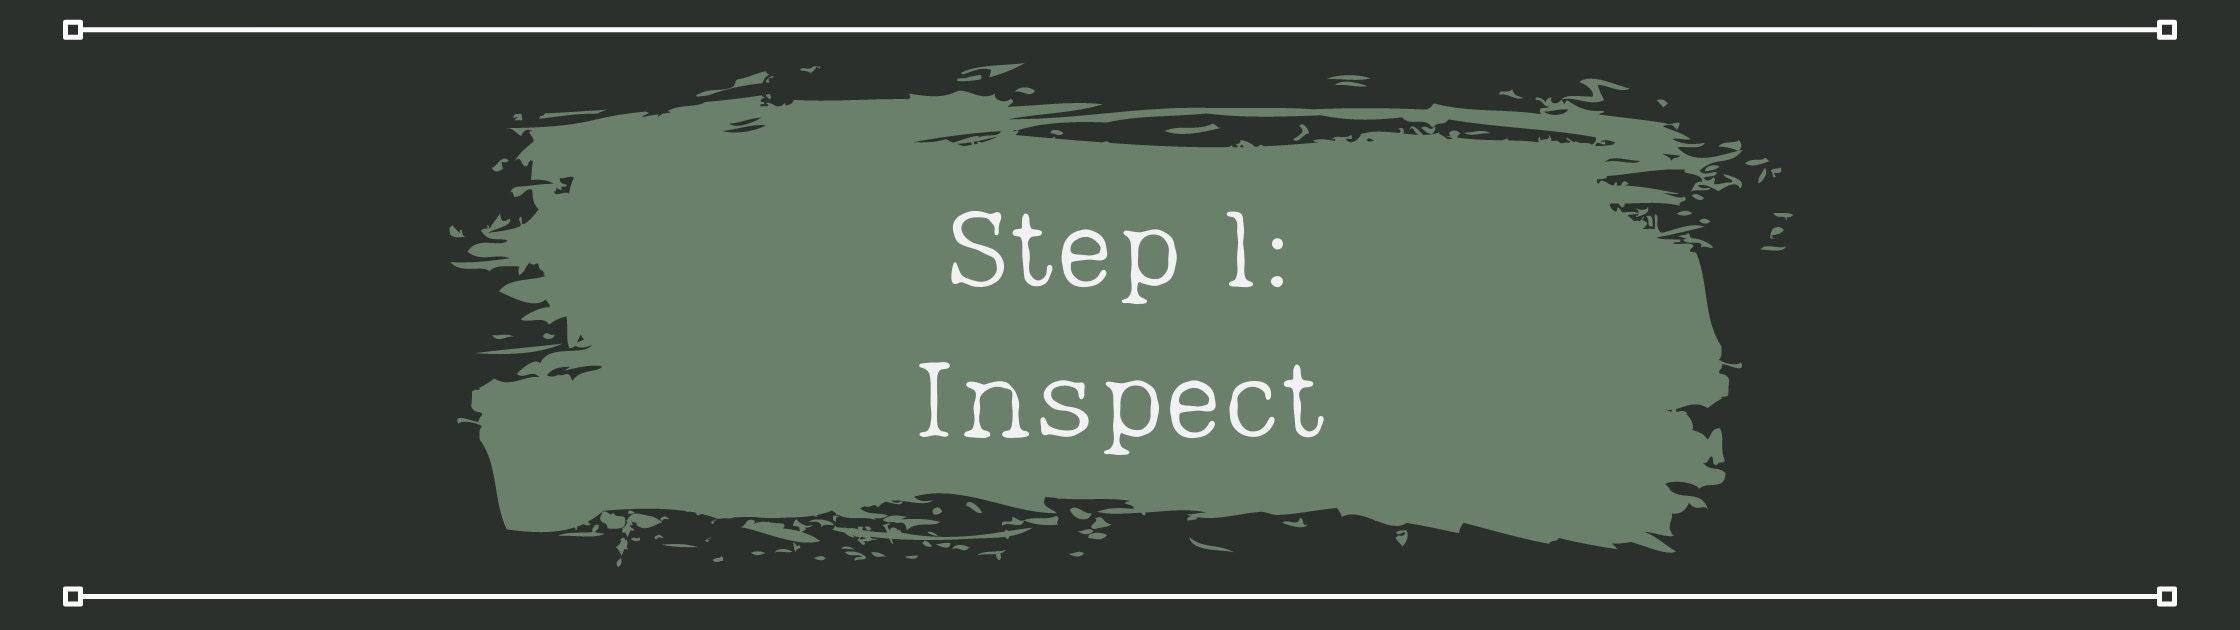 Step 1 - Inspect